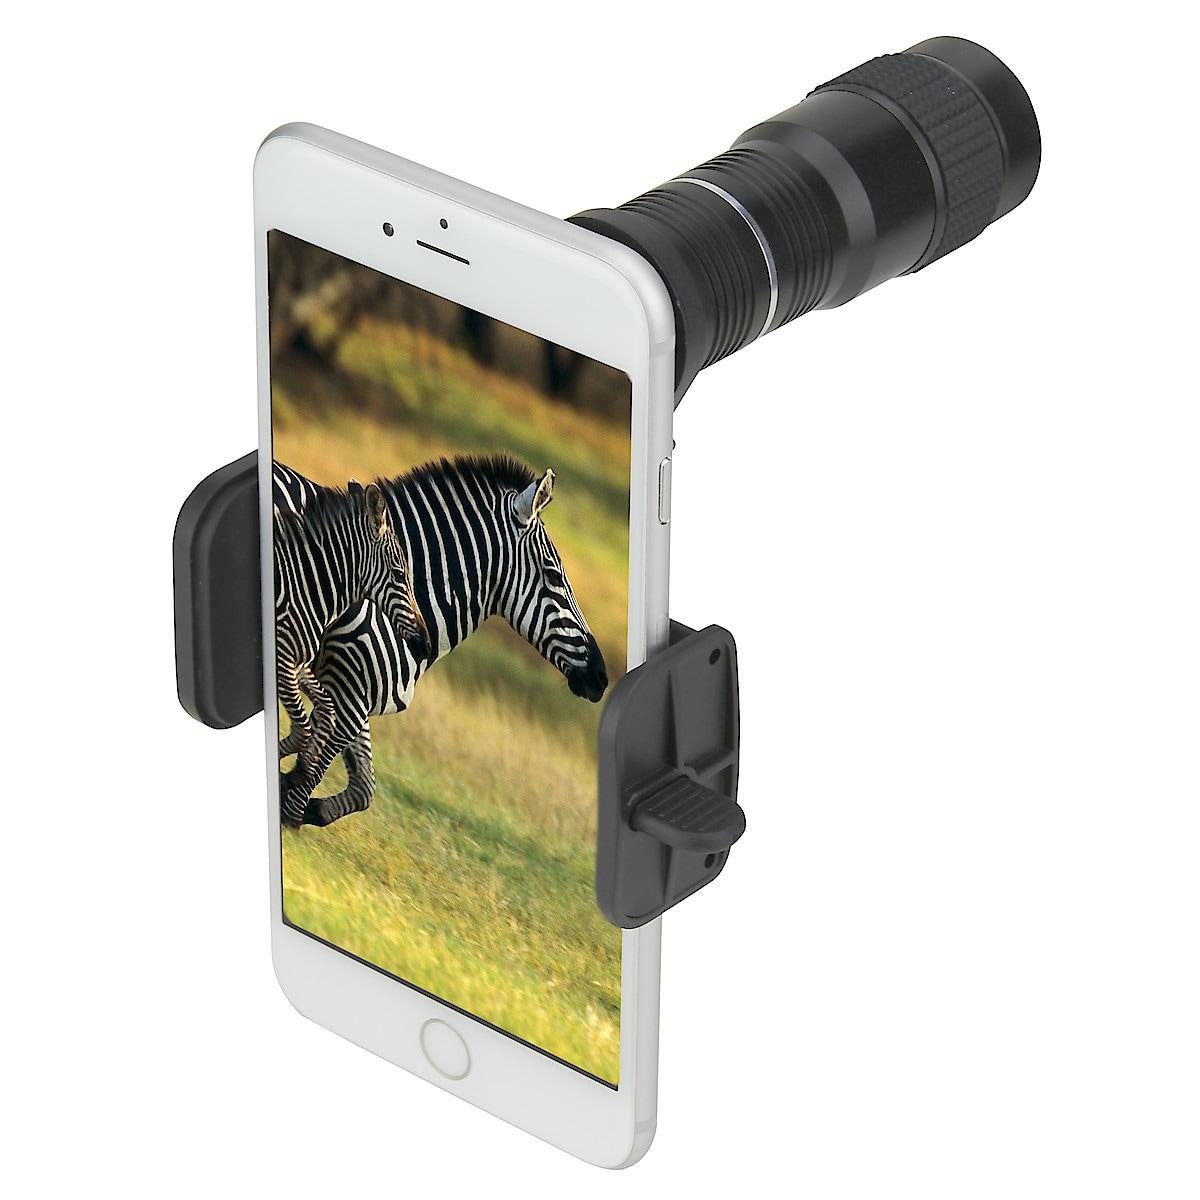 Carson HookUpz 6x18 mm objektiv til smartphone